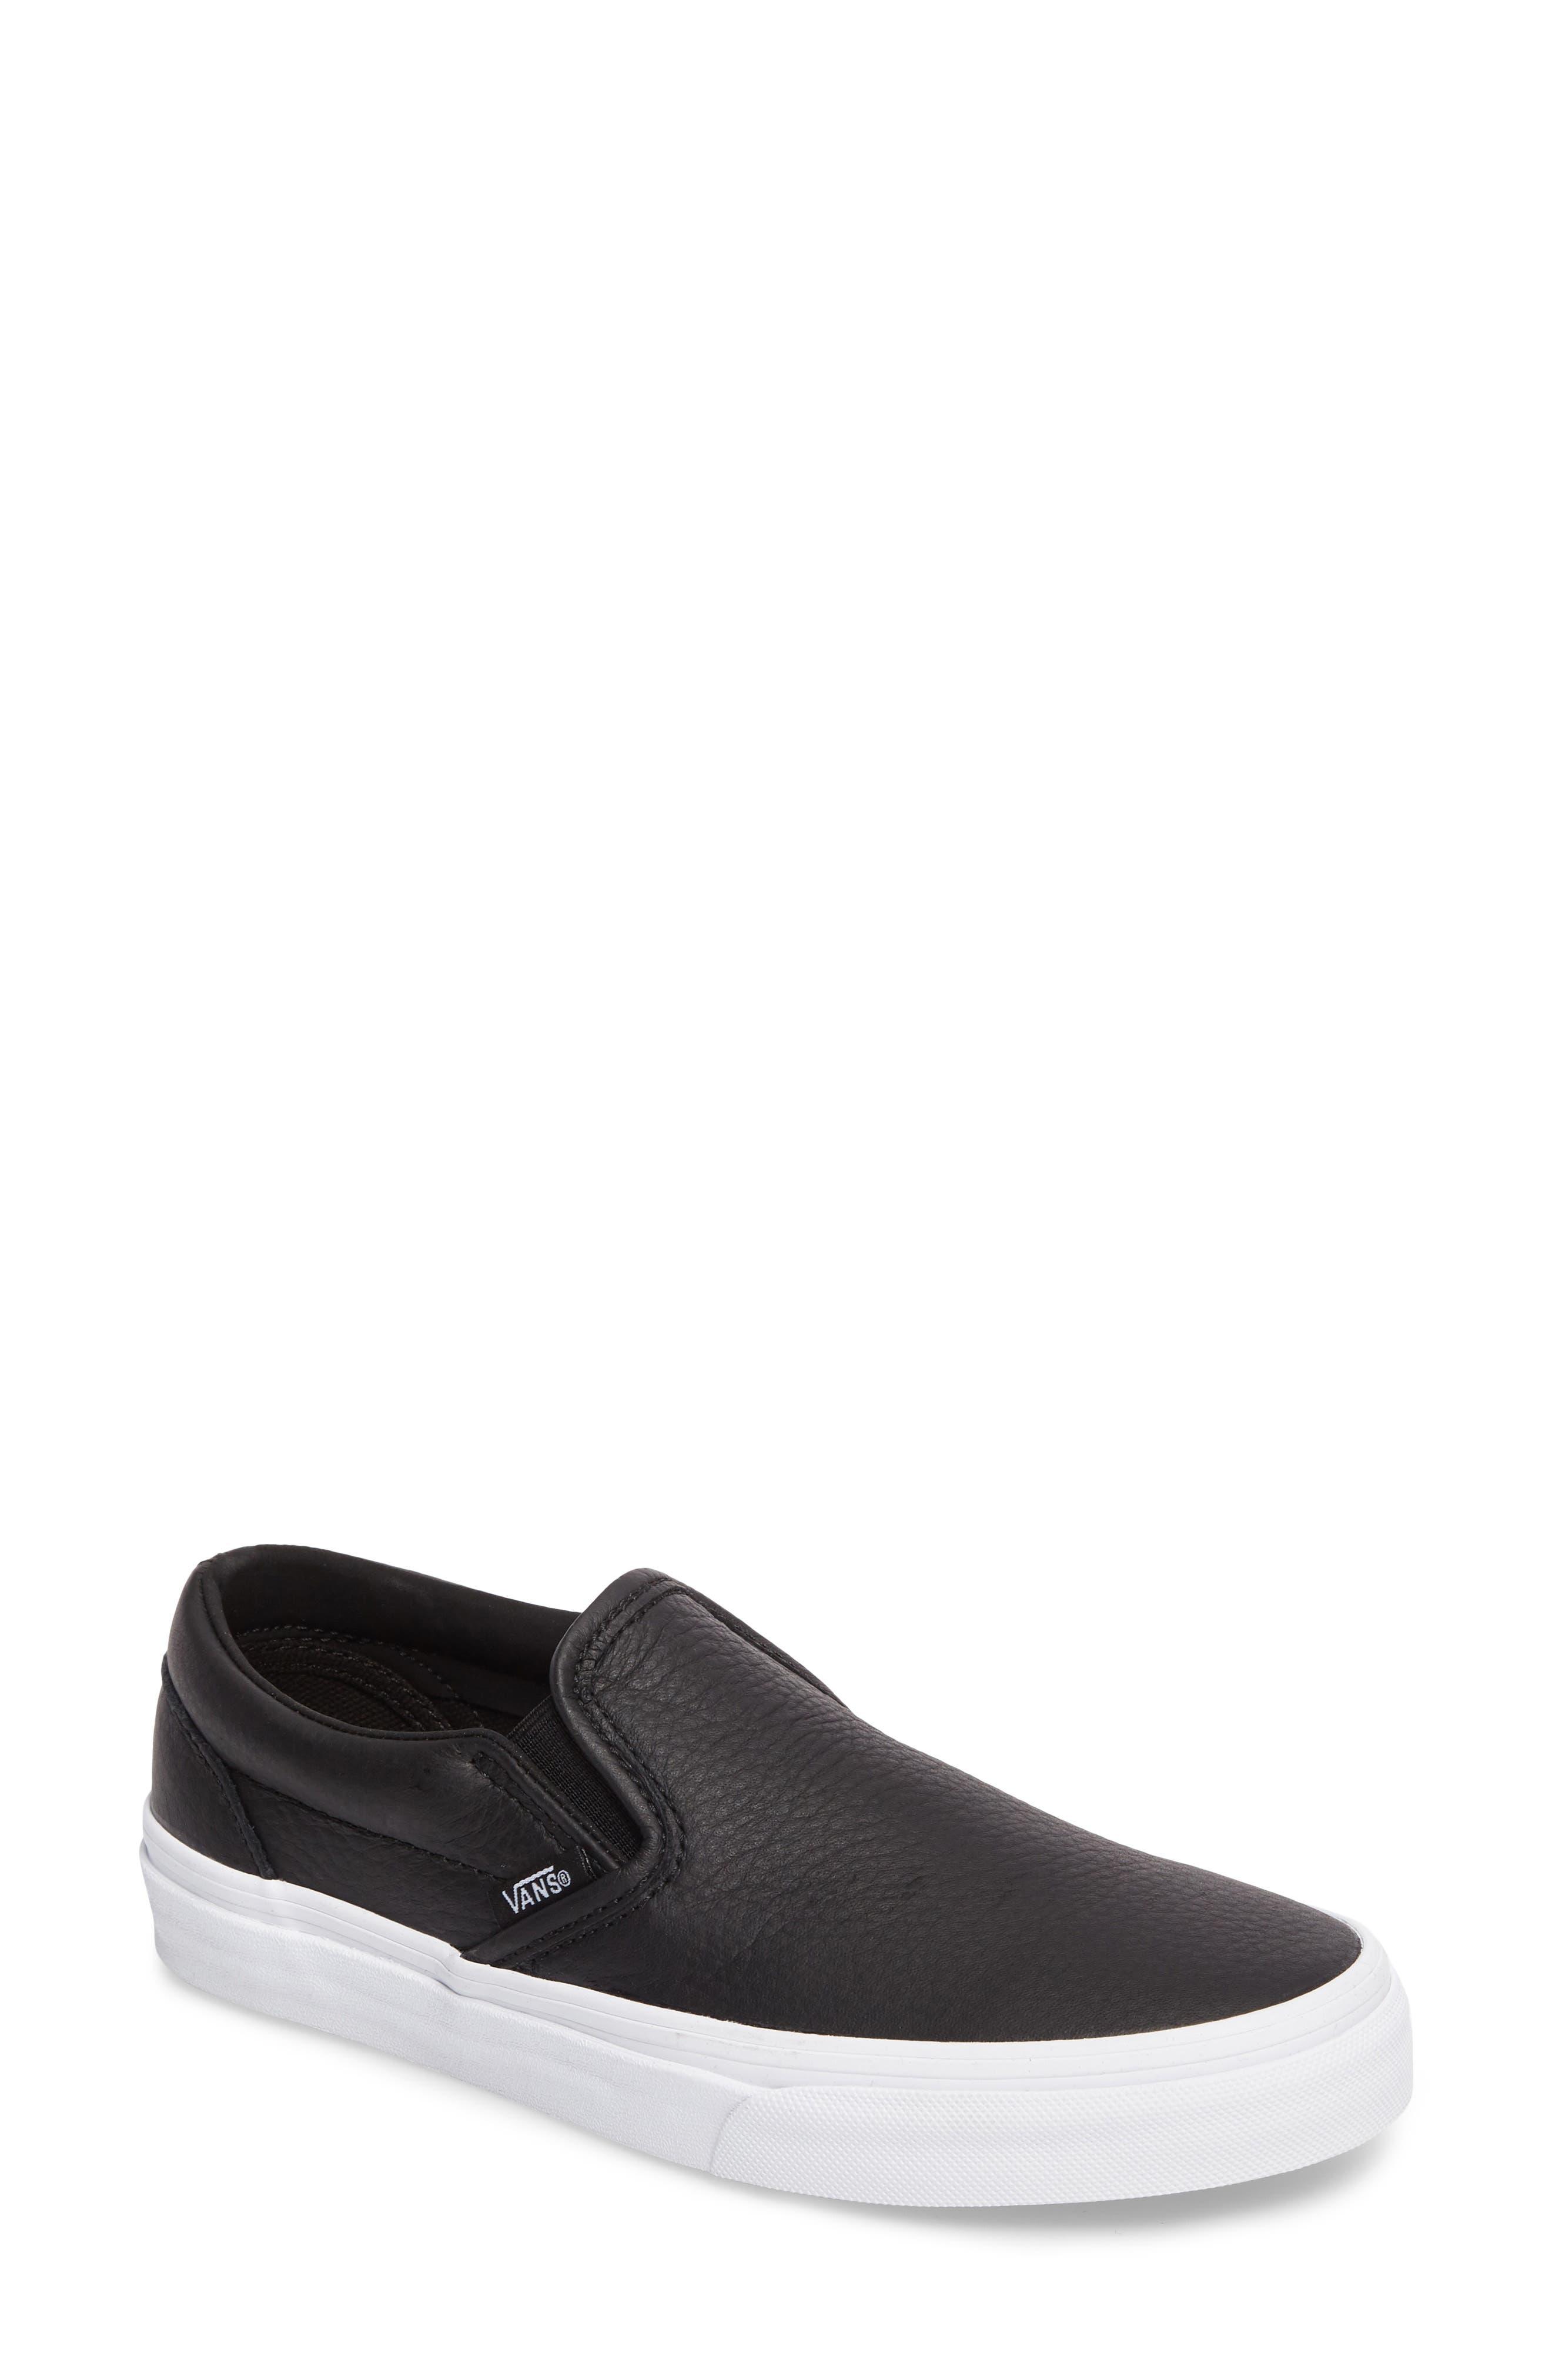 Classic Slip-On Sneaker,                         Main,                         color, BLACK/ TRUE WHITE